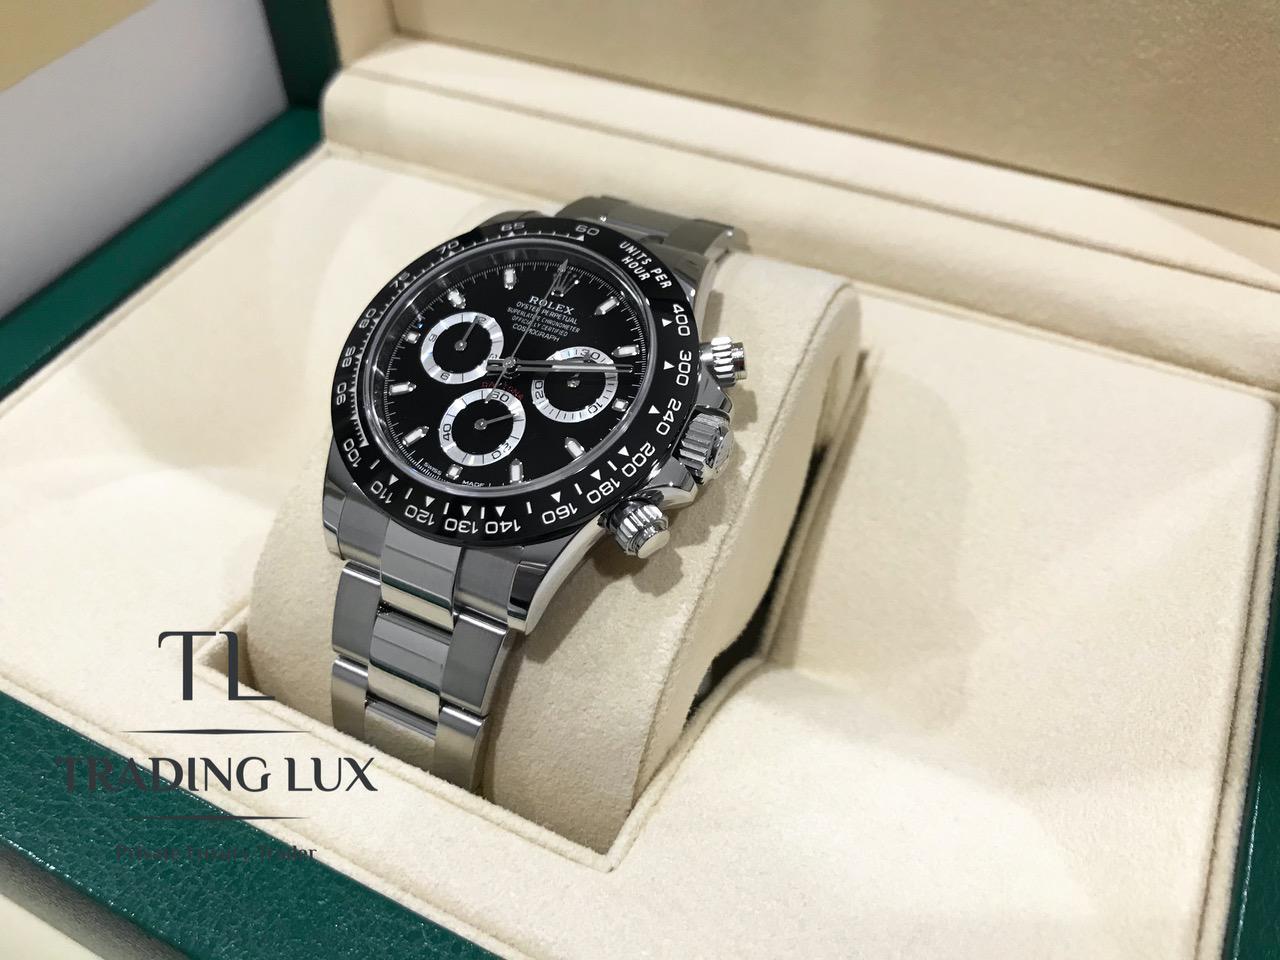 Rolex-Daytona-116500LN-Black-7